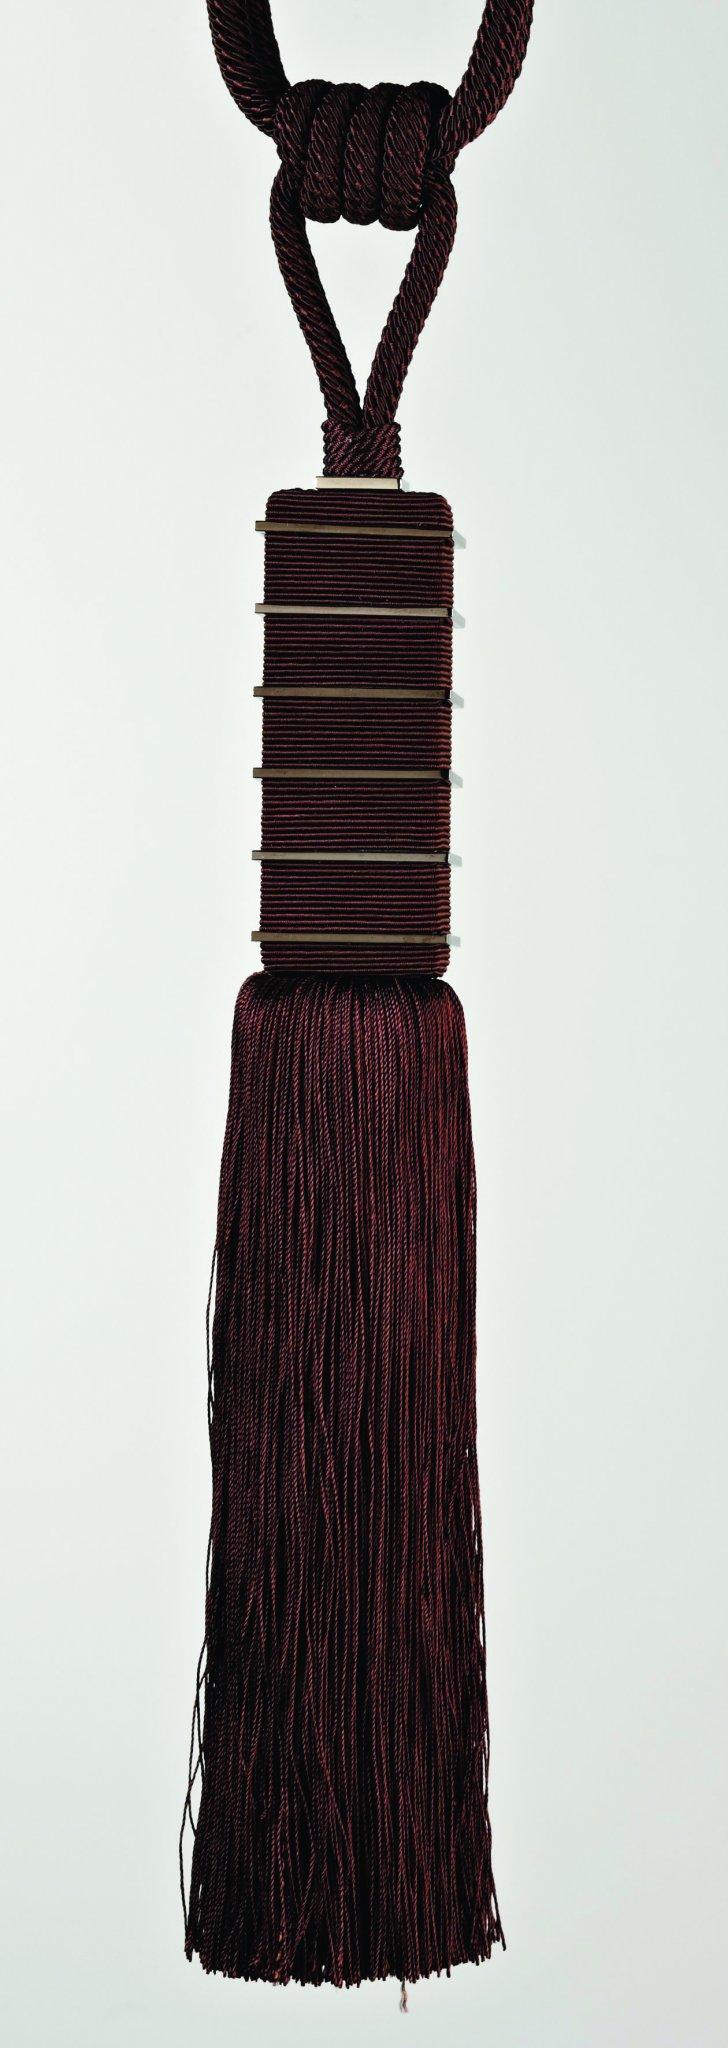 Hallis Rolls Pagoda Curtain Tieback